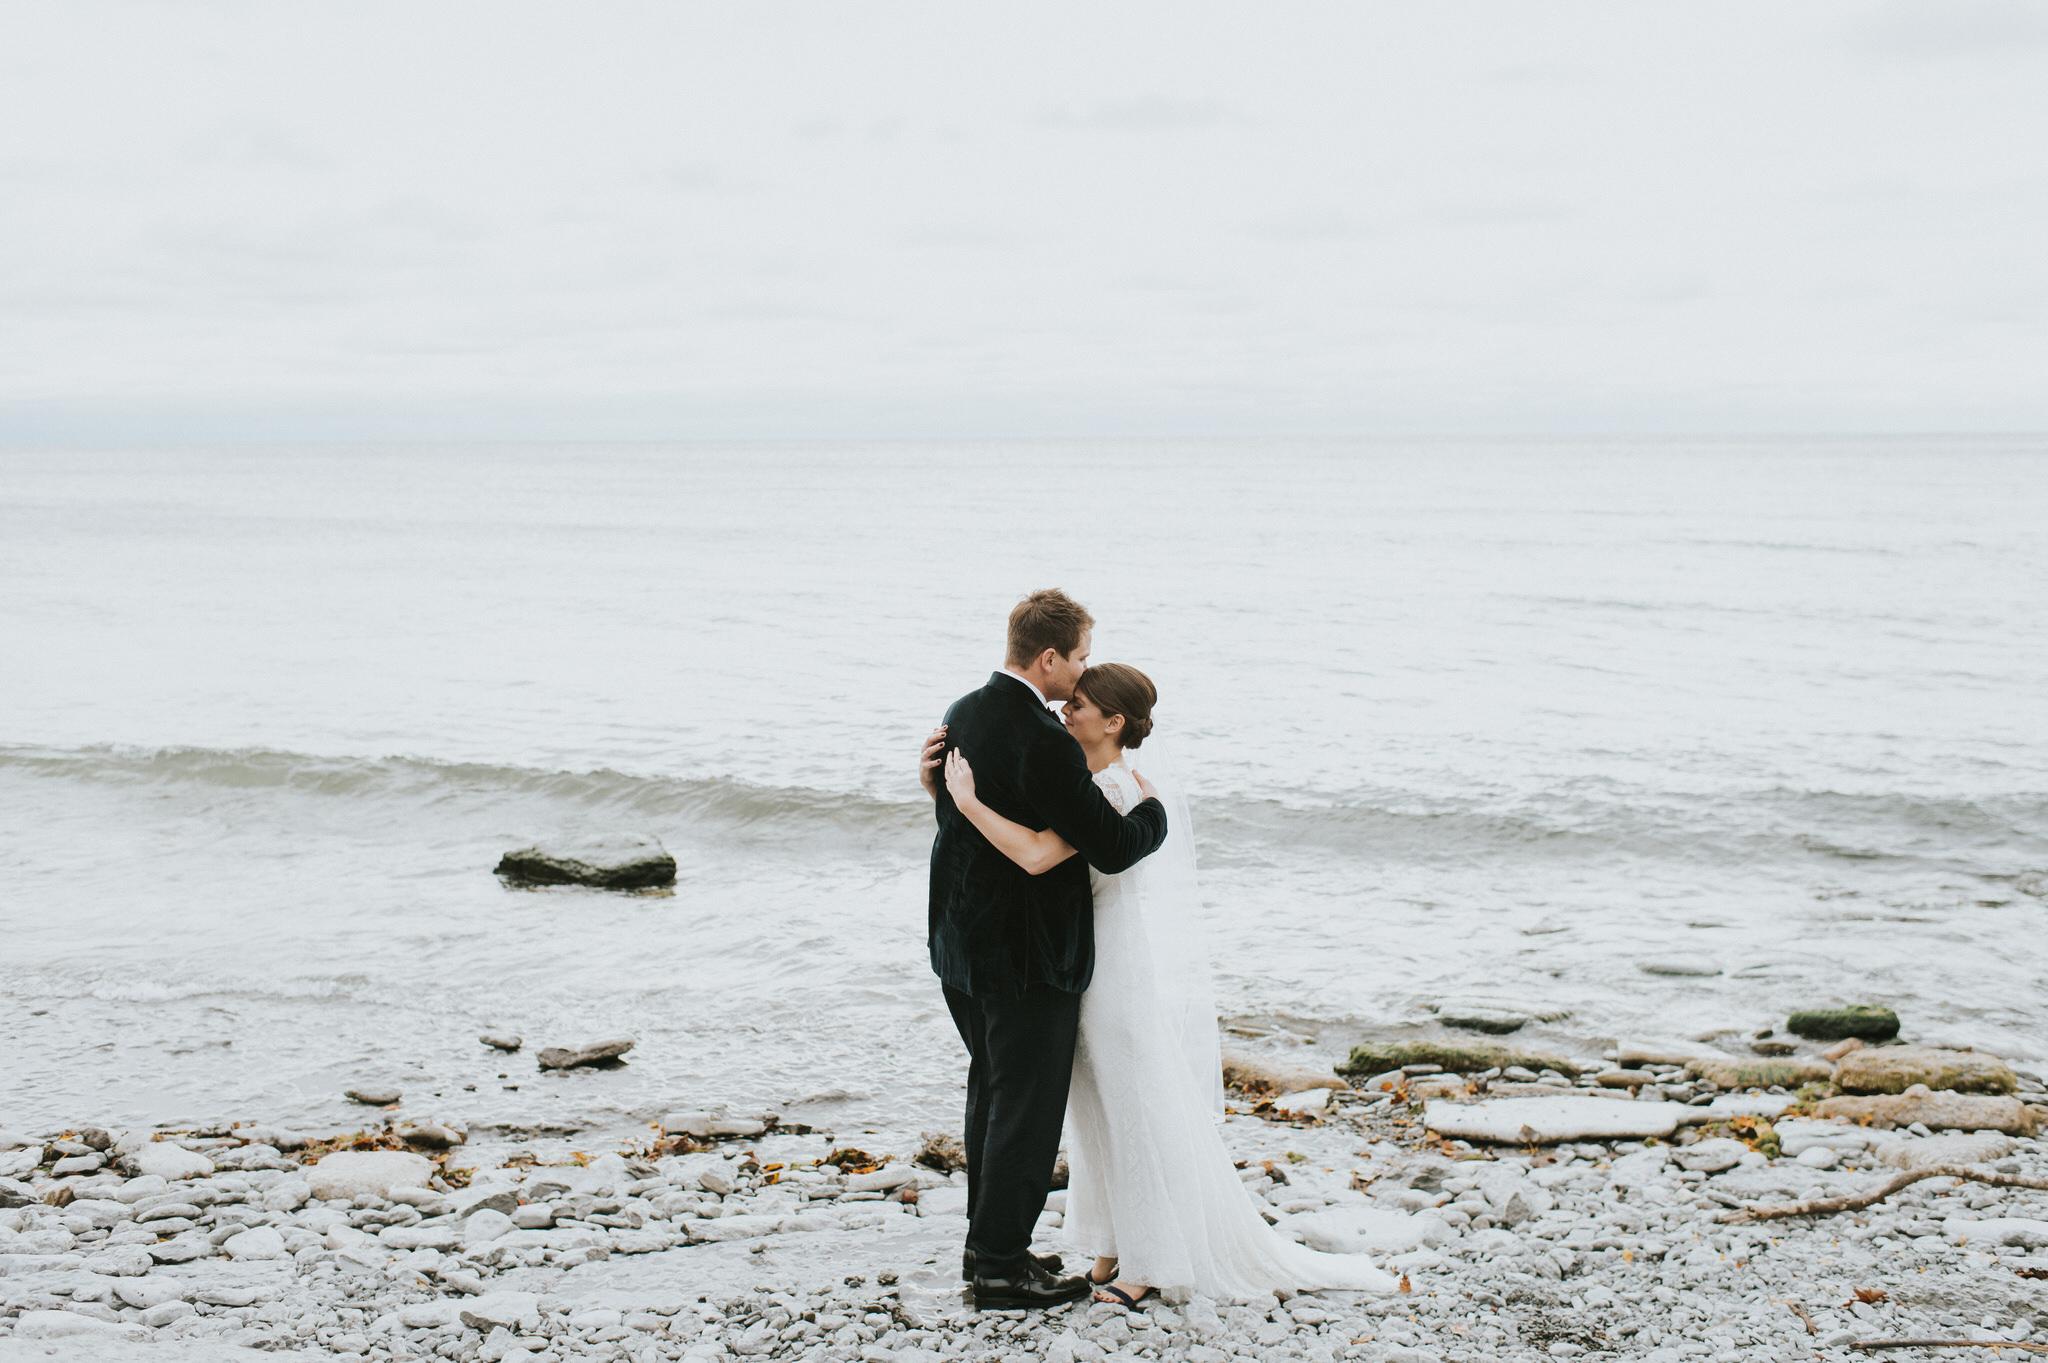 scarletoneillphotography_weddingphotography_prince edward county weddings036.JPG